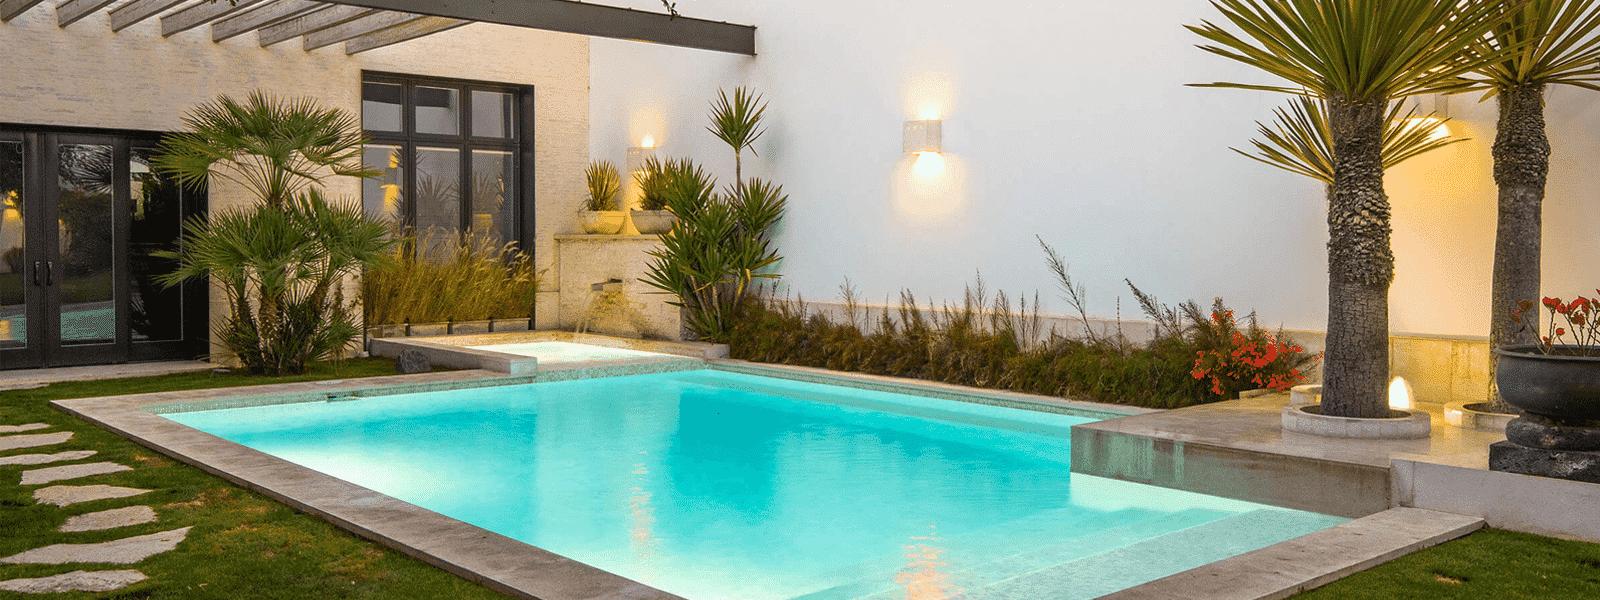 beautiful pool remodeling with custom design